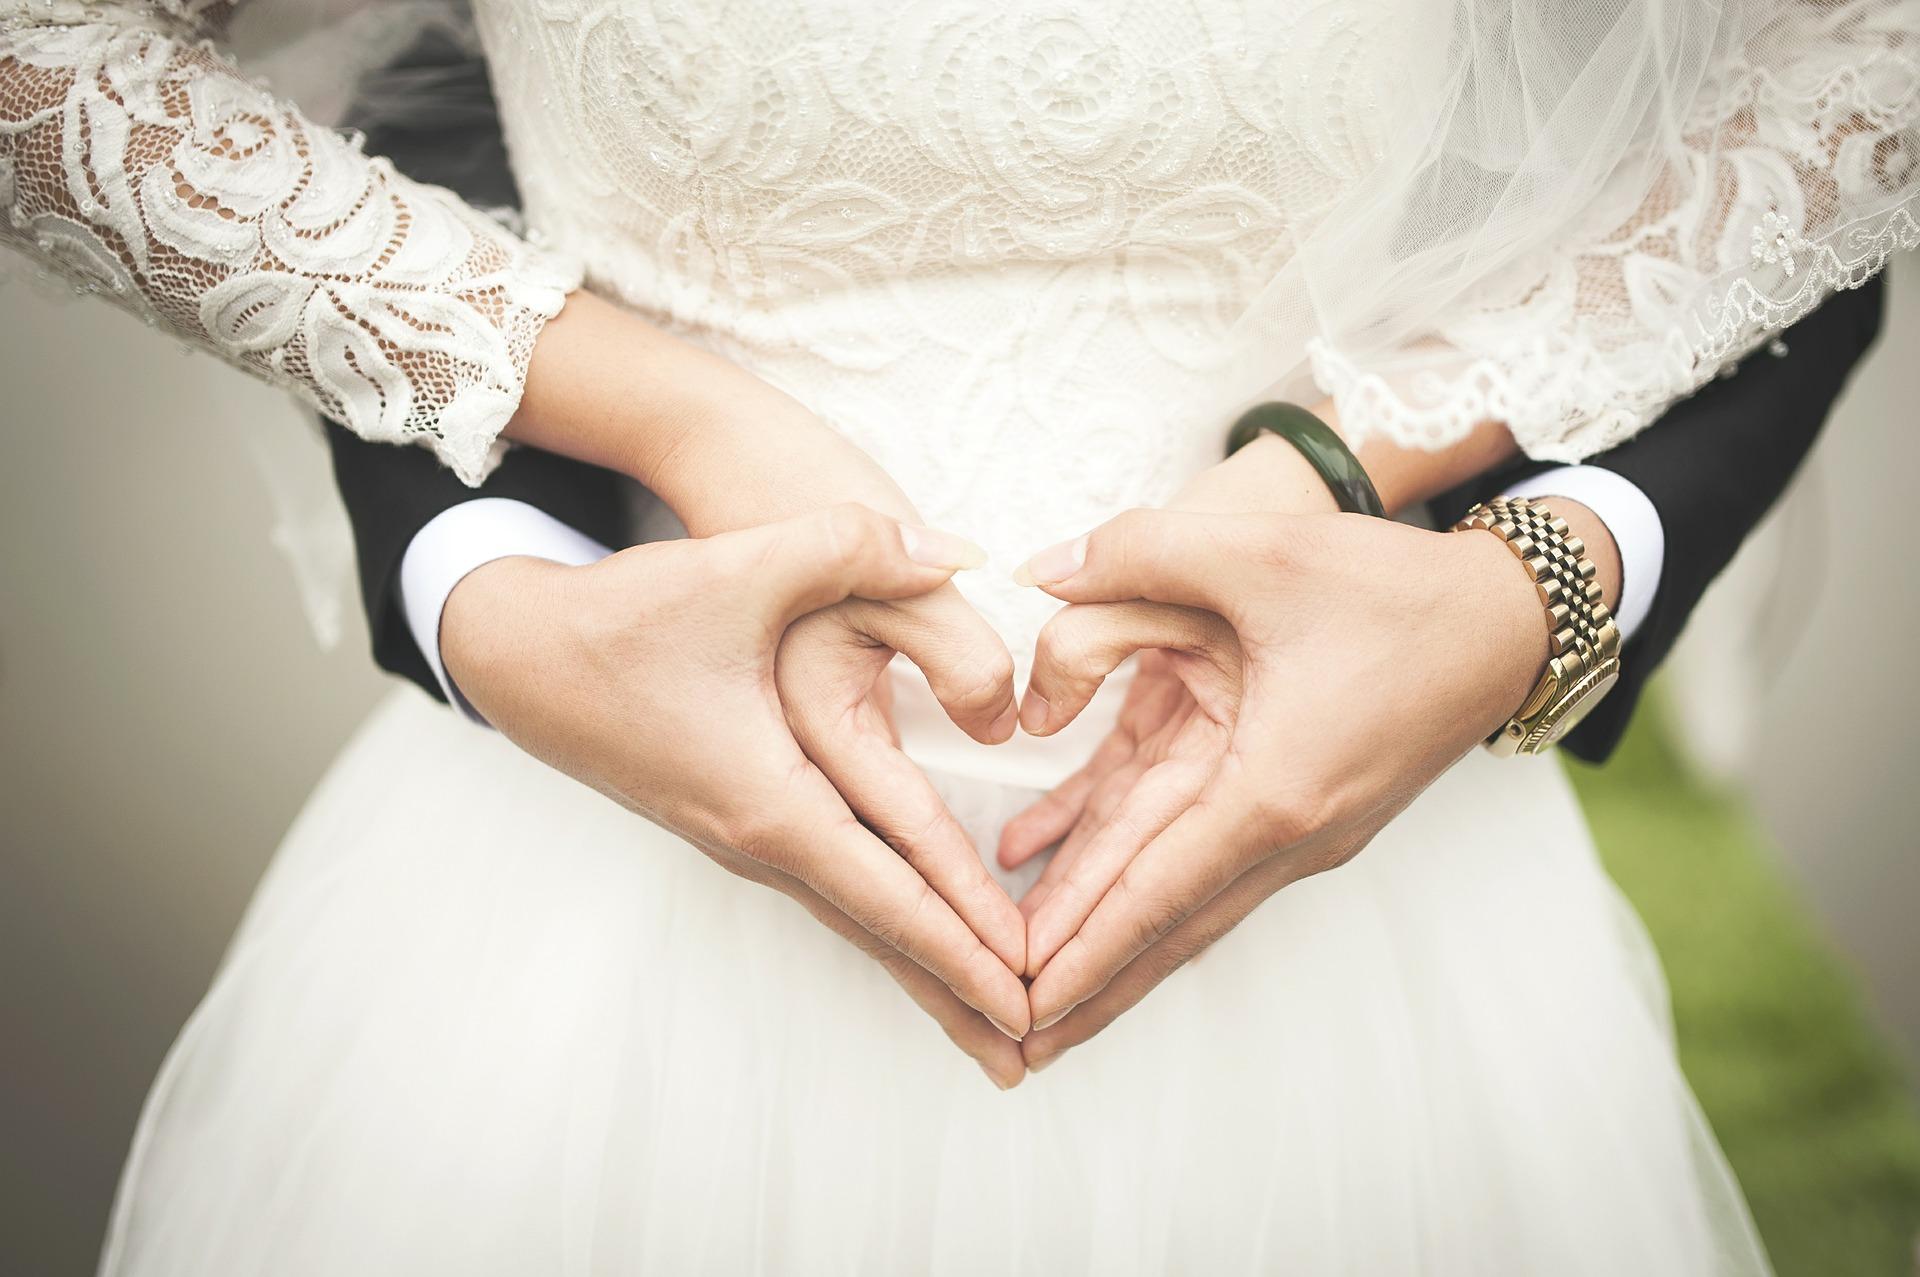 relacionamento-duradouro-5-ingredientes-psicologa-online